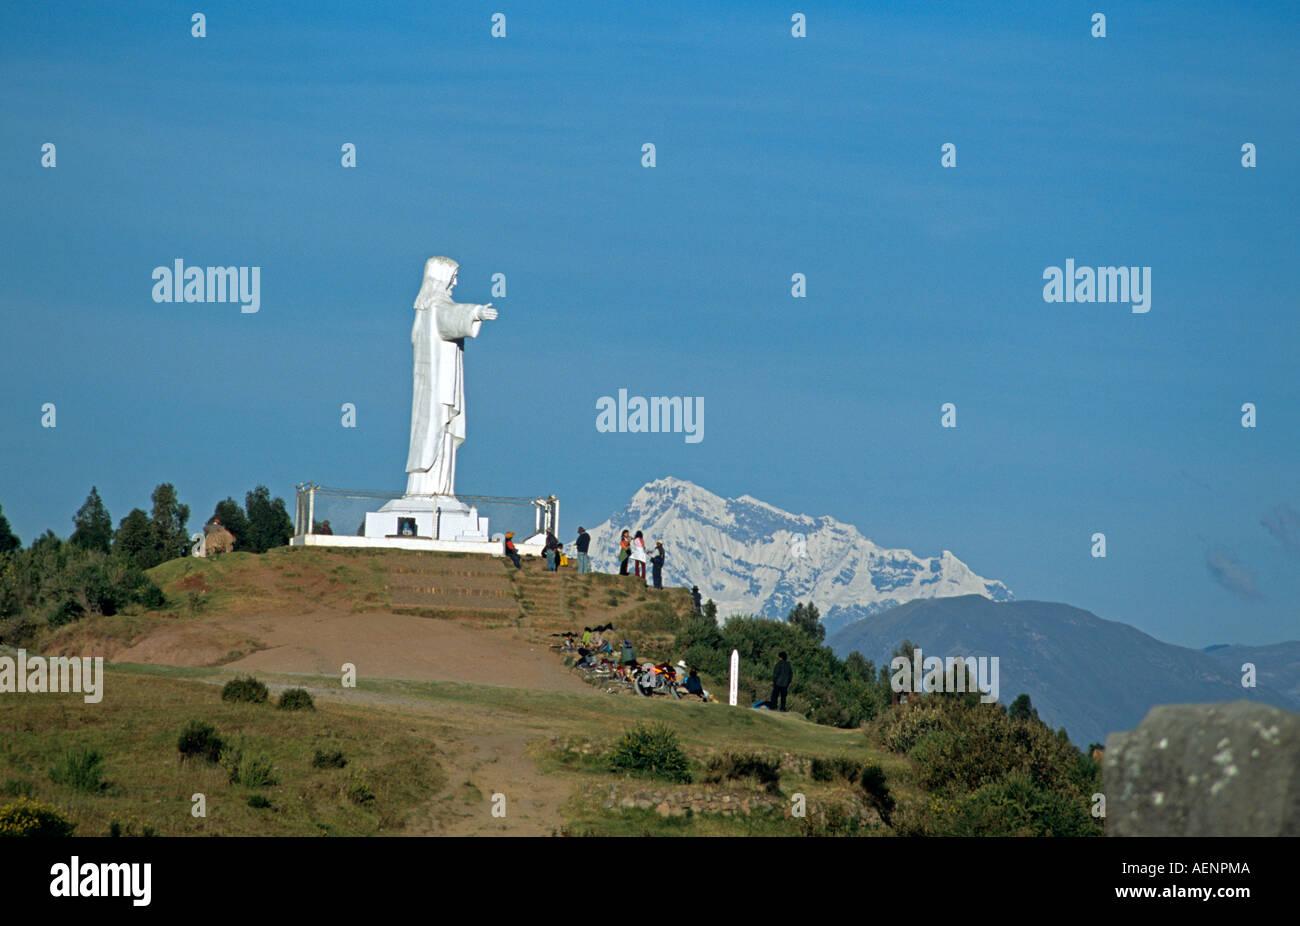 Mountain living near cusco peru royalty free stock photo - Statue Of Jesus Christ Ausangate Mountain Photo Taken From Sacsayhuaman Inca Ruins Near Cusco Peru